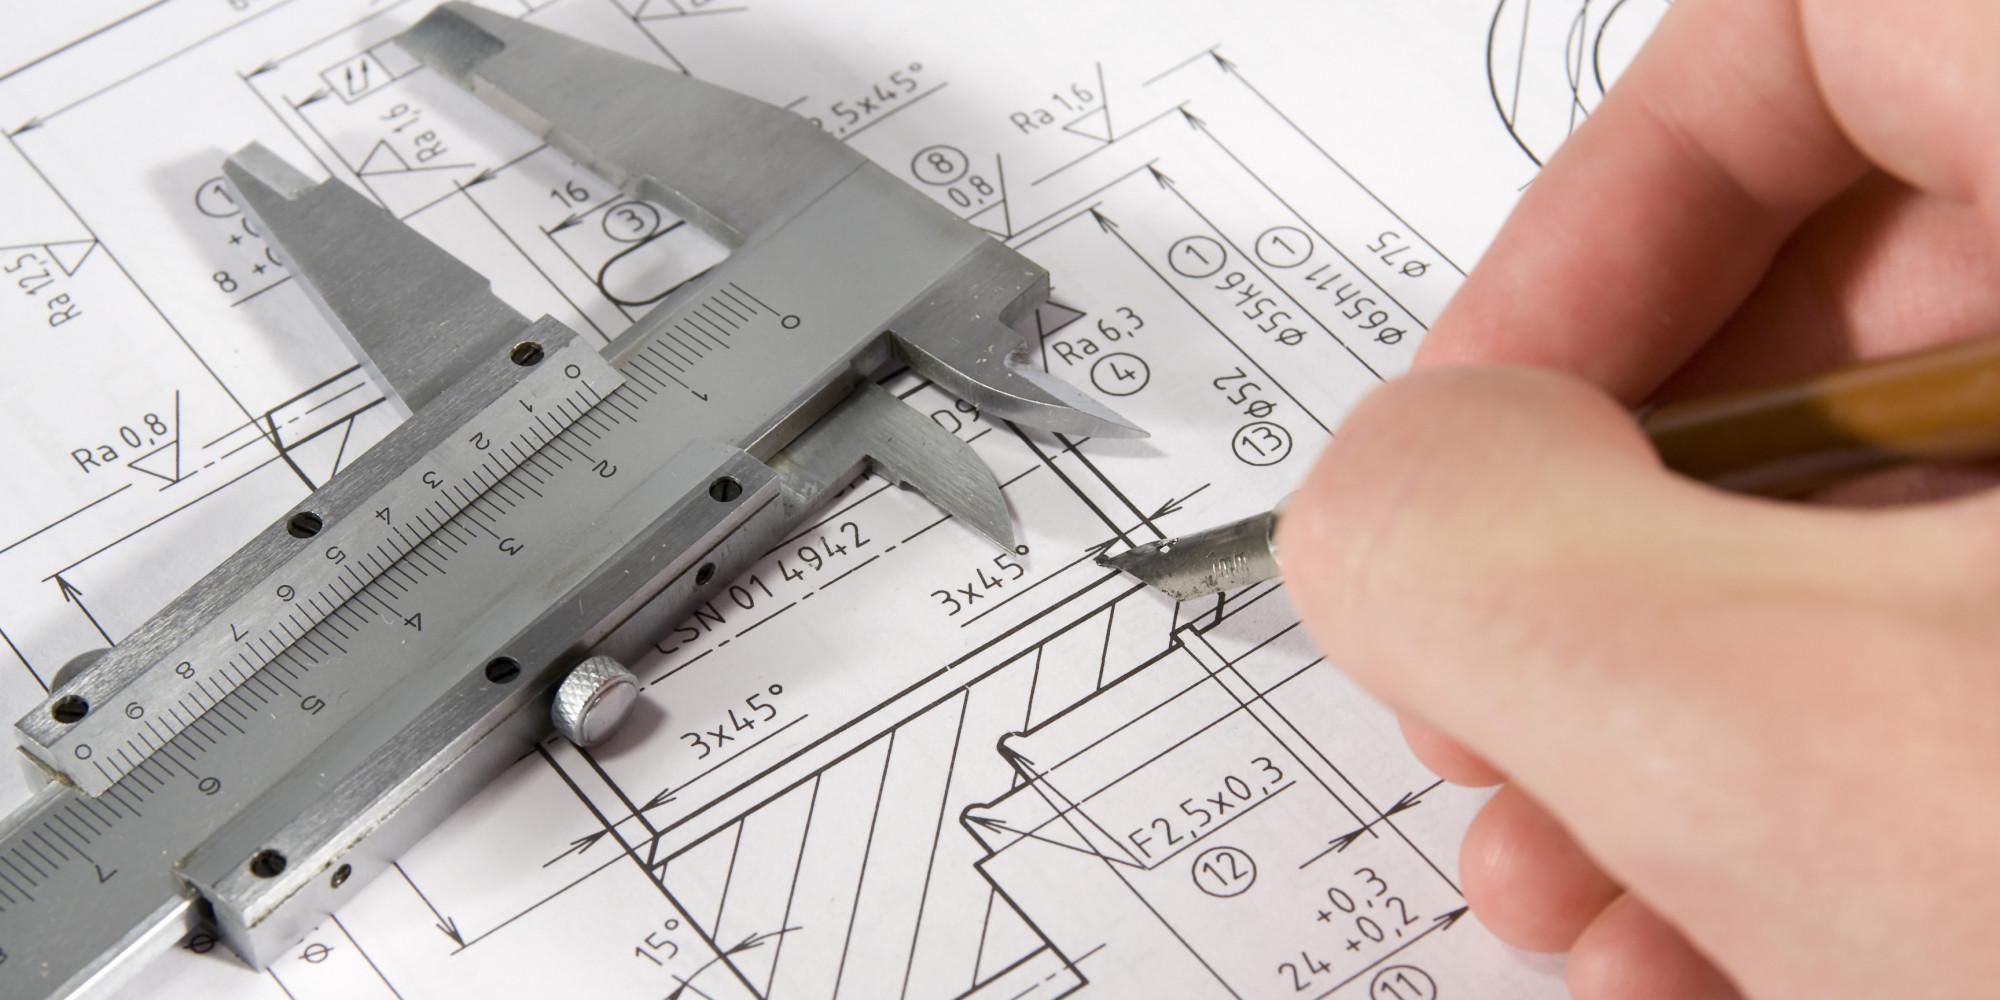 Structural Engineering international studies usyd